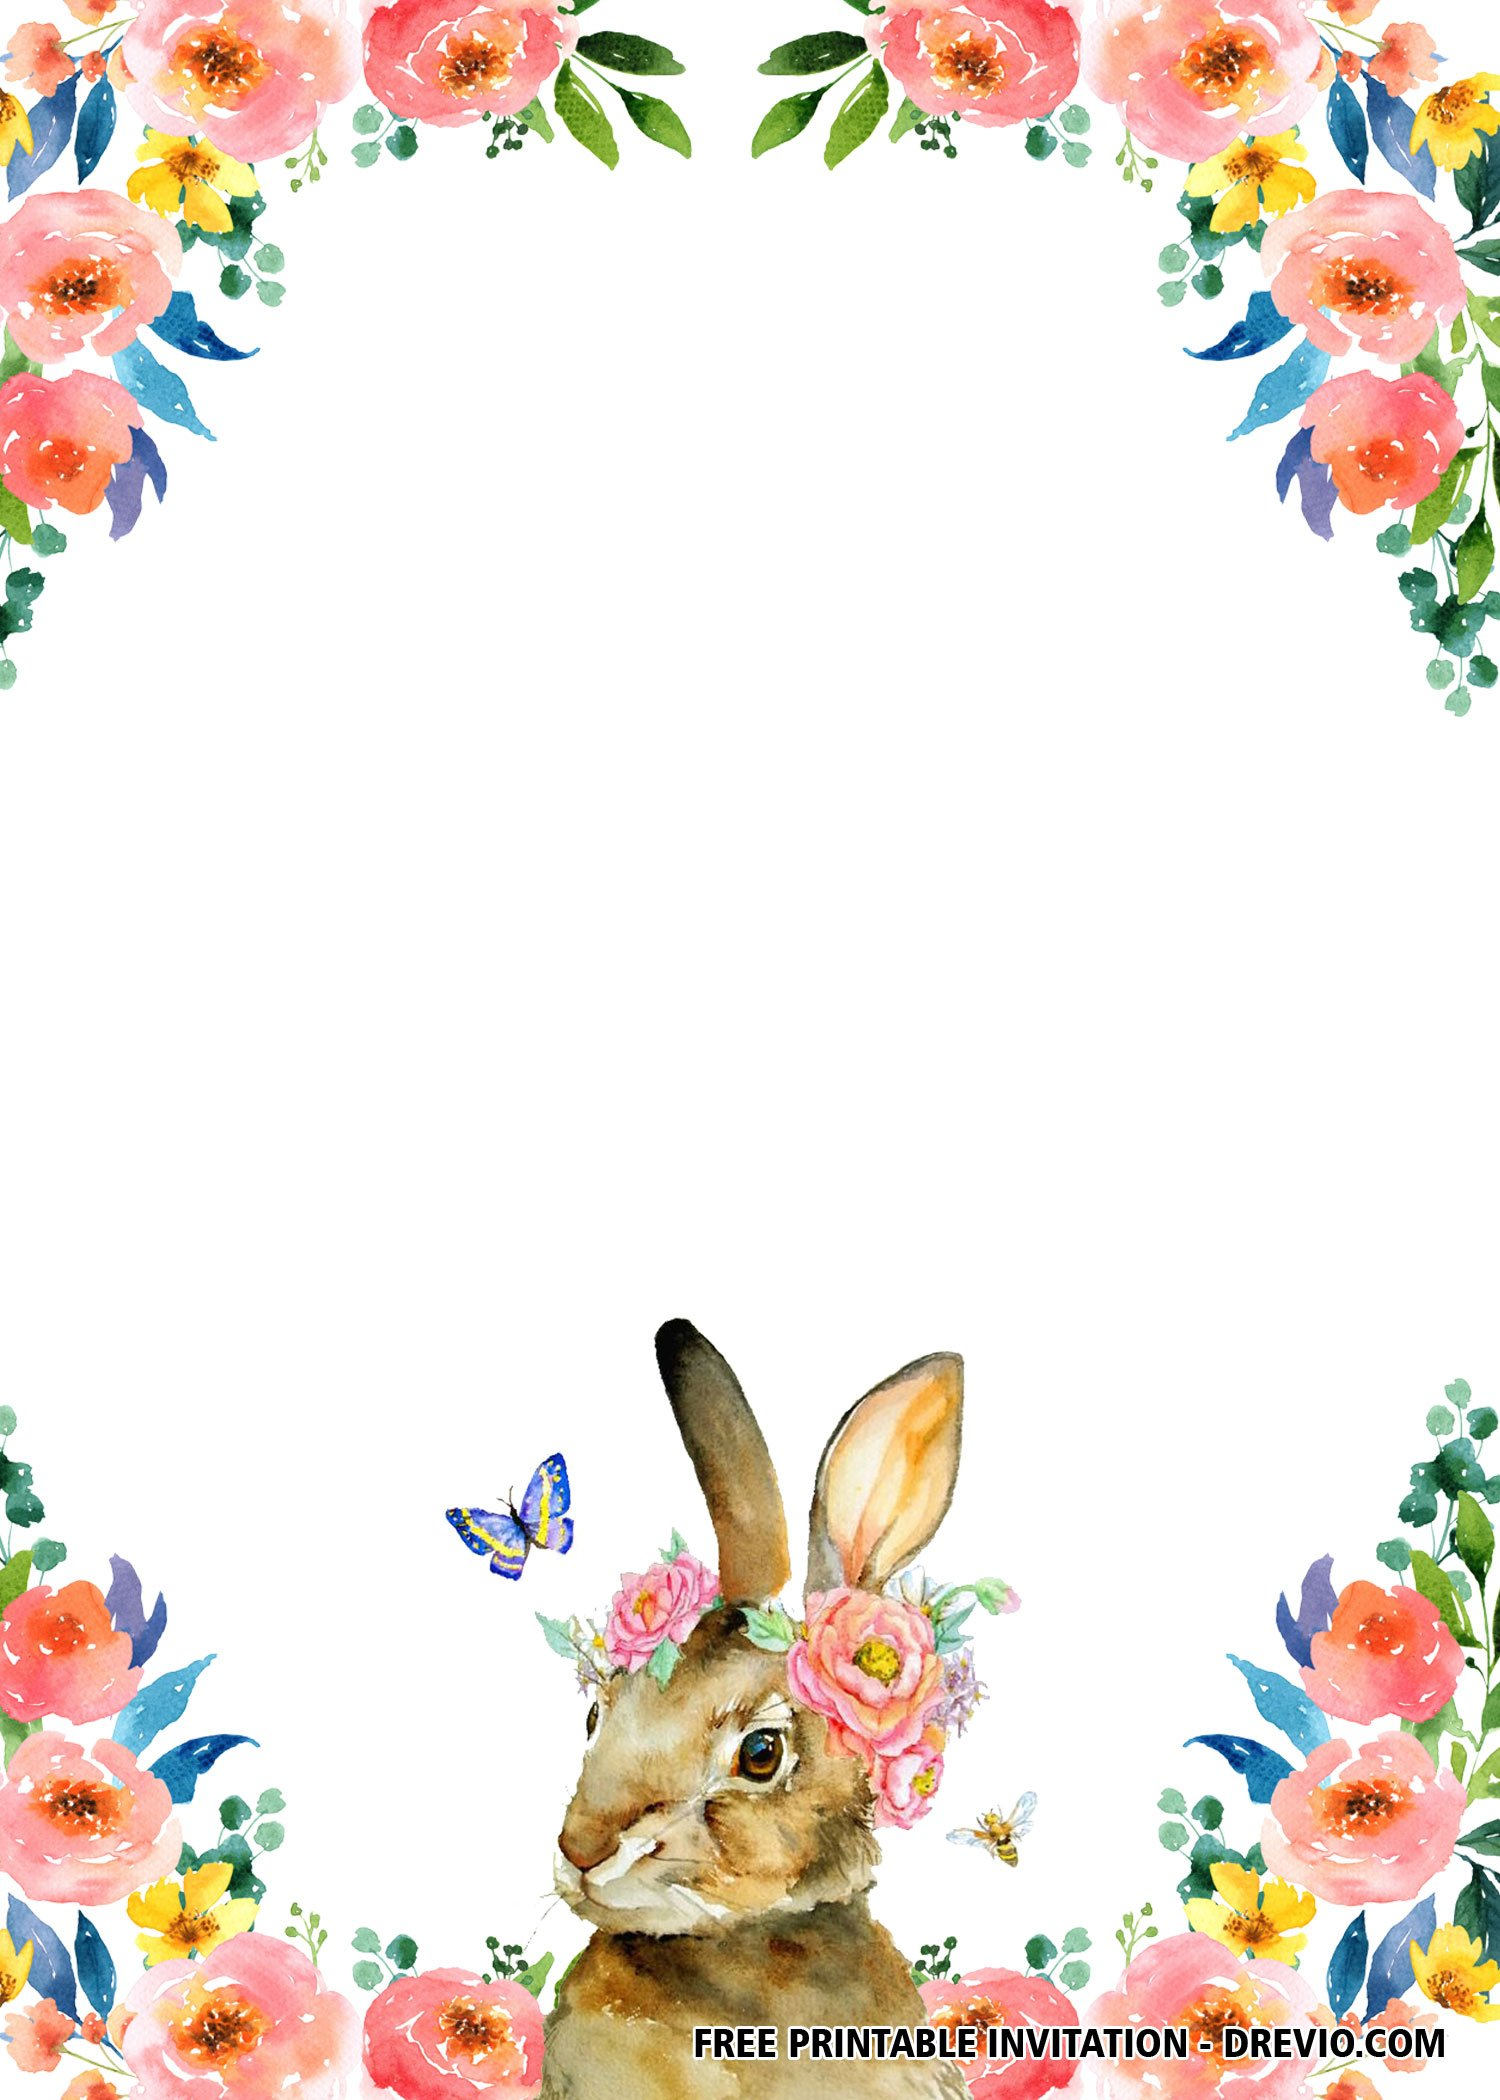 Free Printable Twin Rabbit Flower Invitation Templates